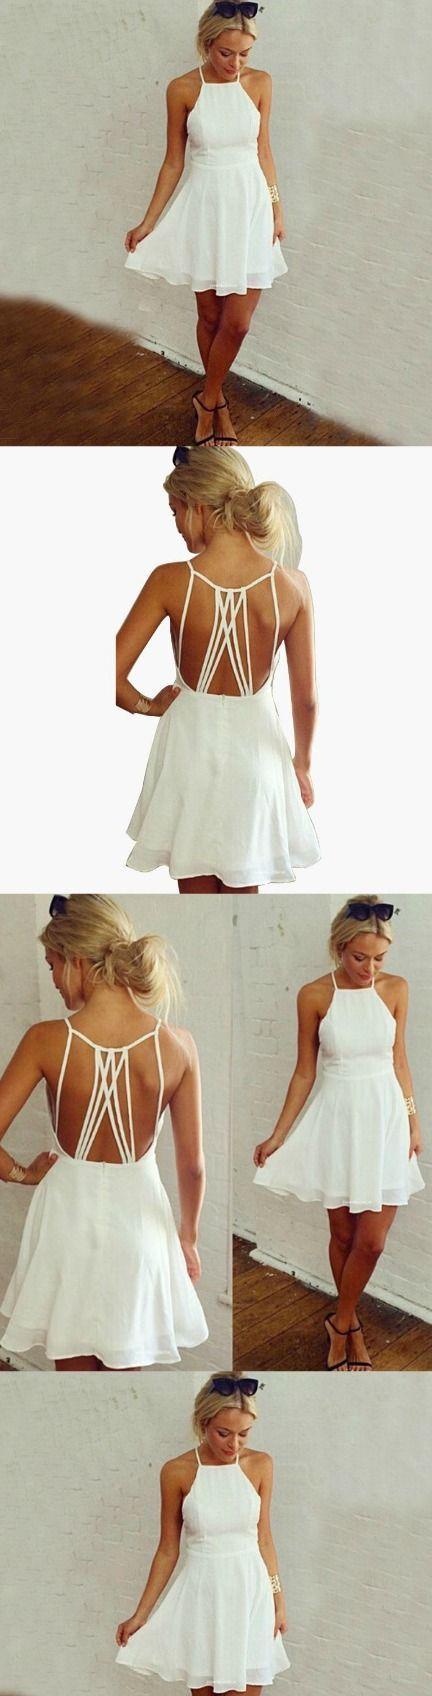 White Homecoming Dress,Short Party Dress,Backless Formal Dress,Short Prom Dress